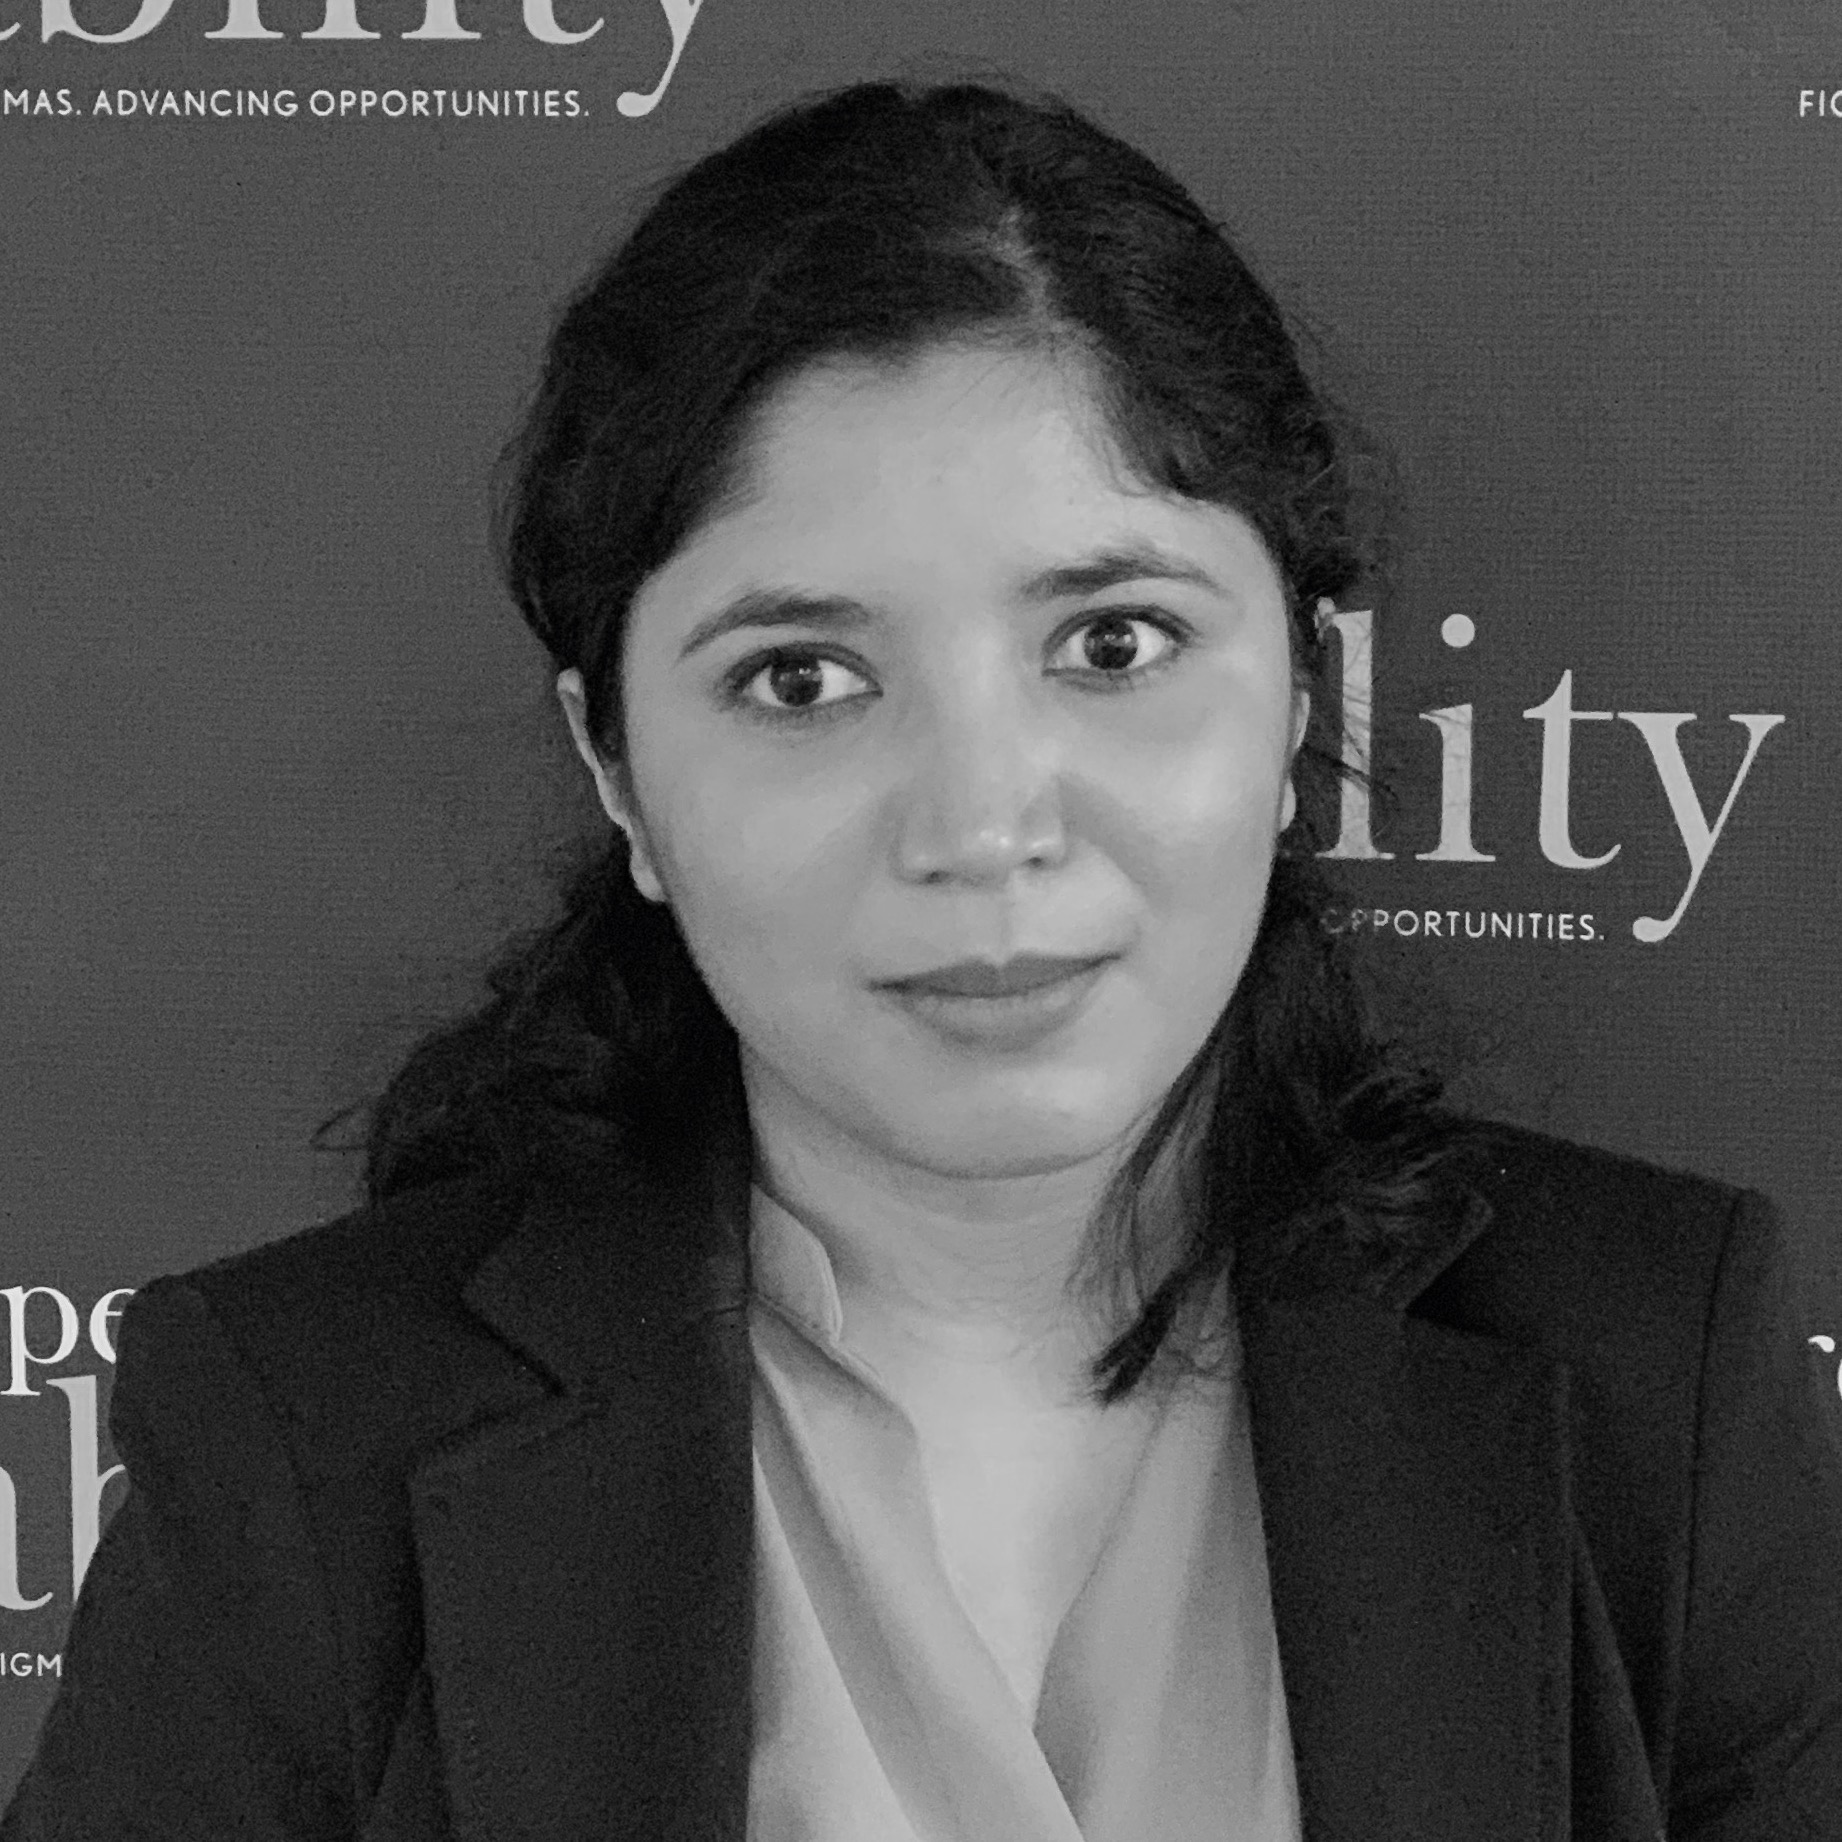 Baksha Ali smiling in front of the RespectAbility banner